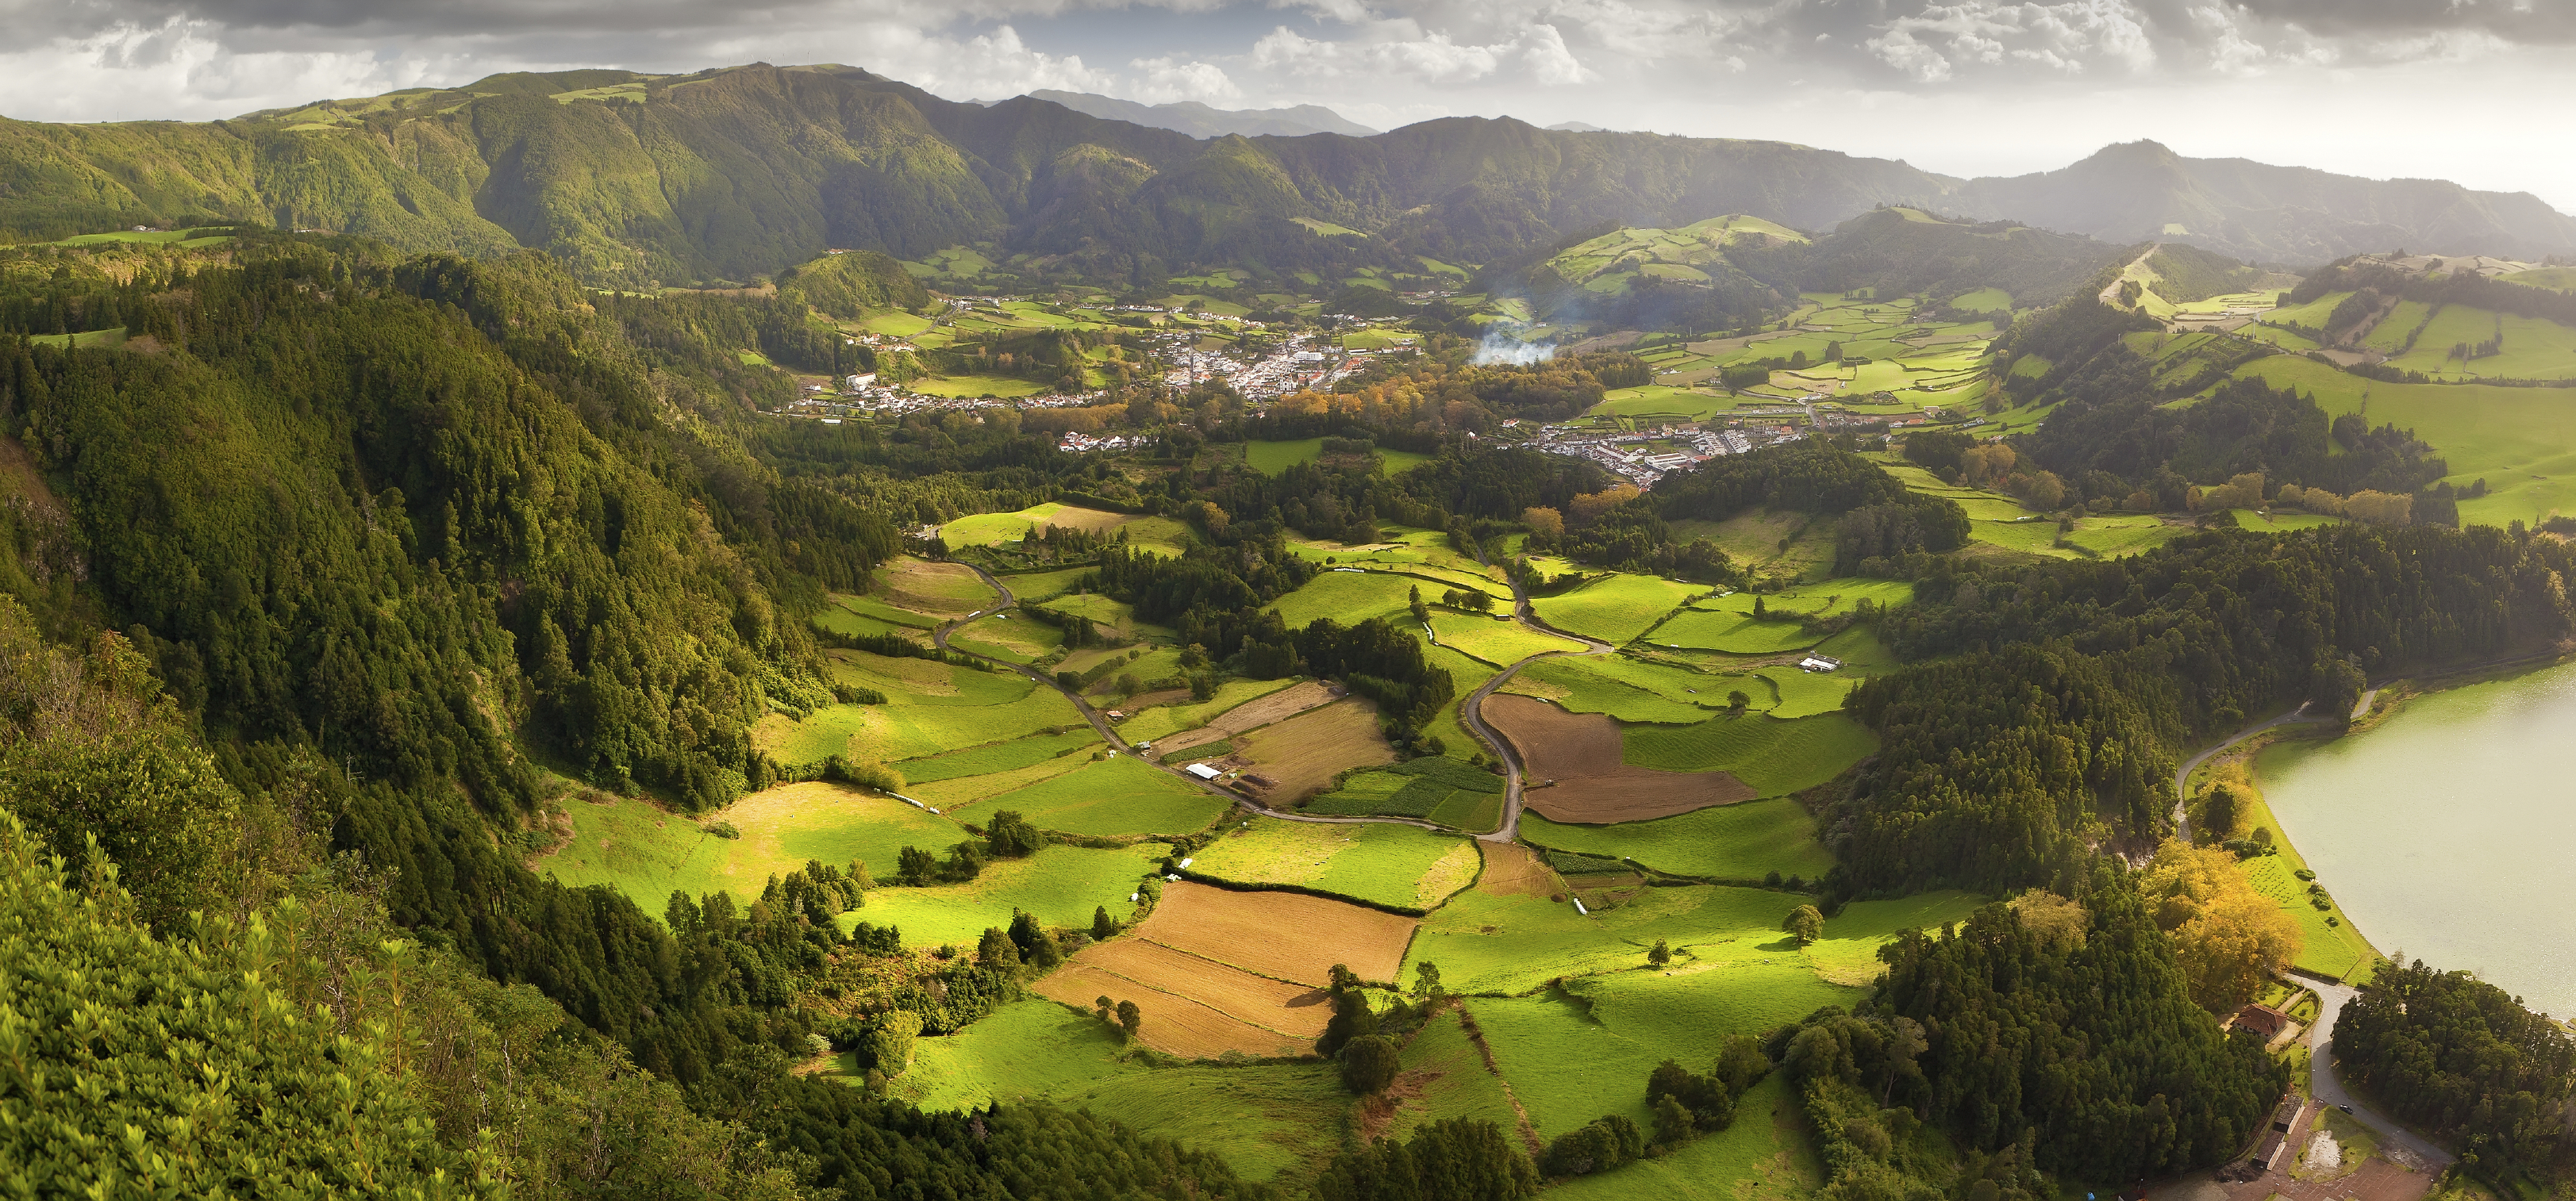 Азорские острова. Фурнаш. Вид долины.